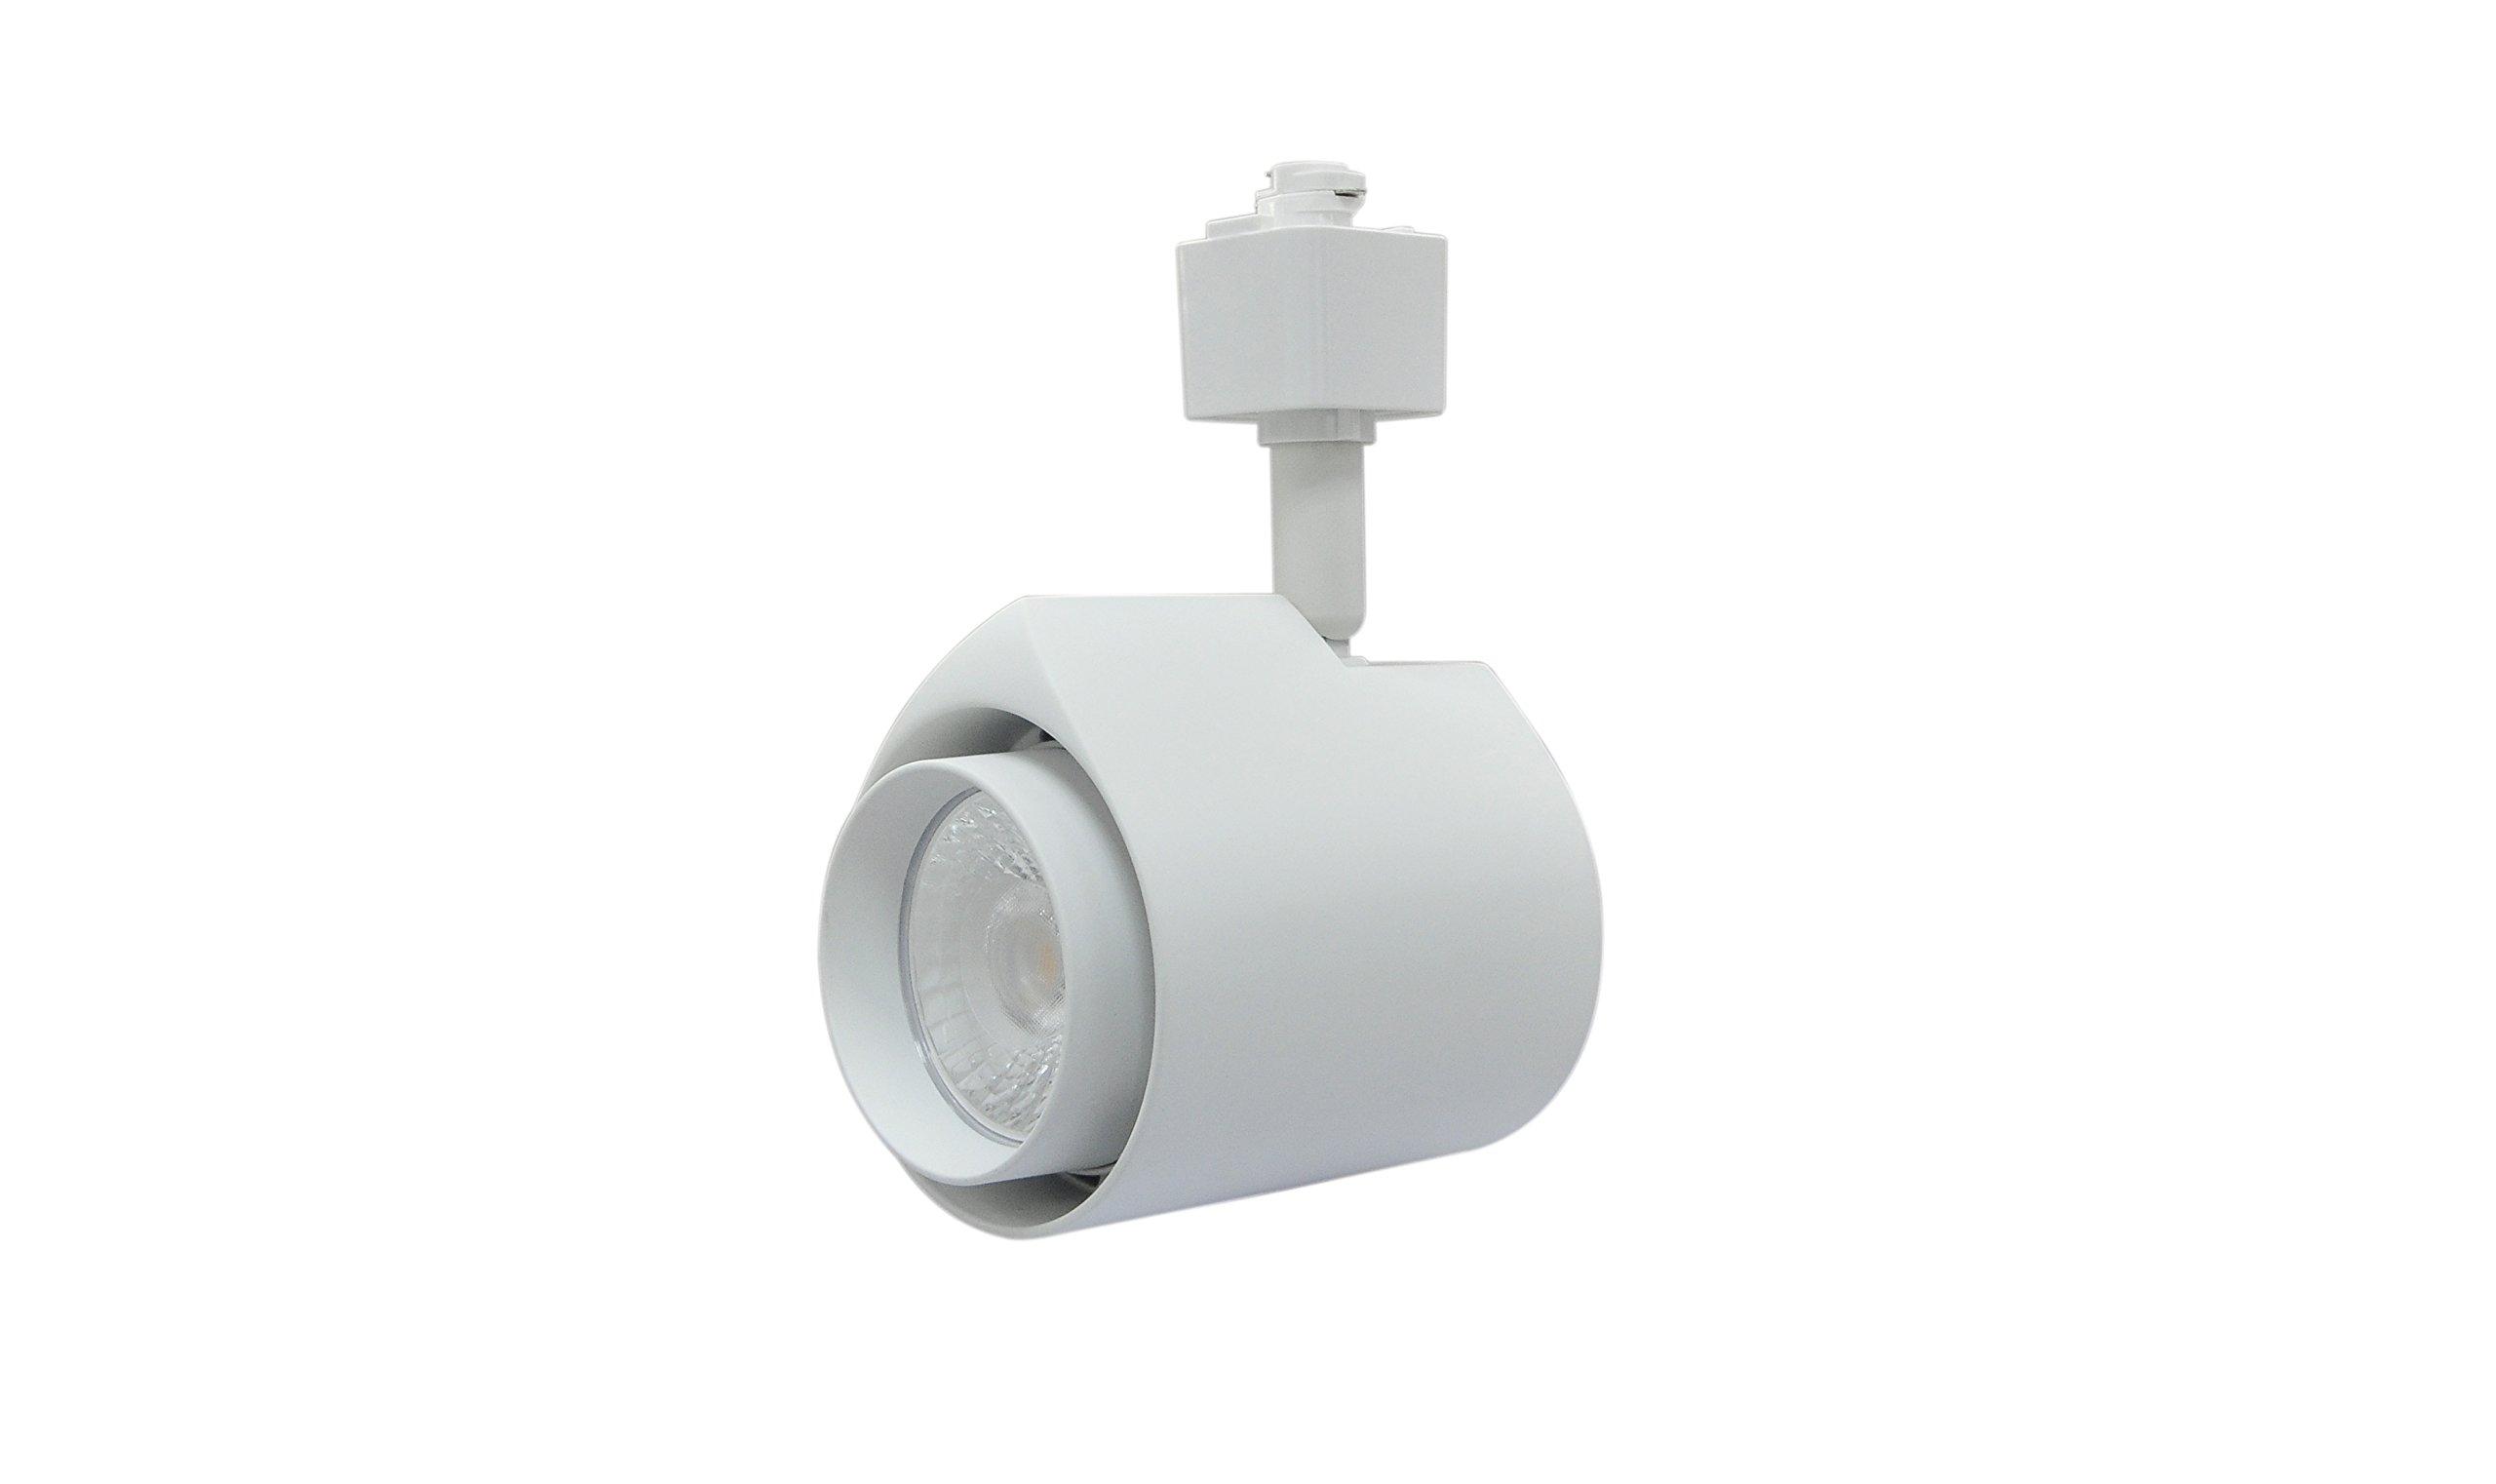 Infinity Green Lighting IG-TR014 22W 3-Wire Round LED H Type Track Head Lighting (White, 5000K)